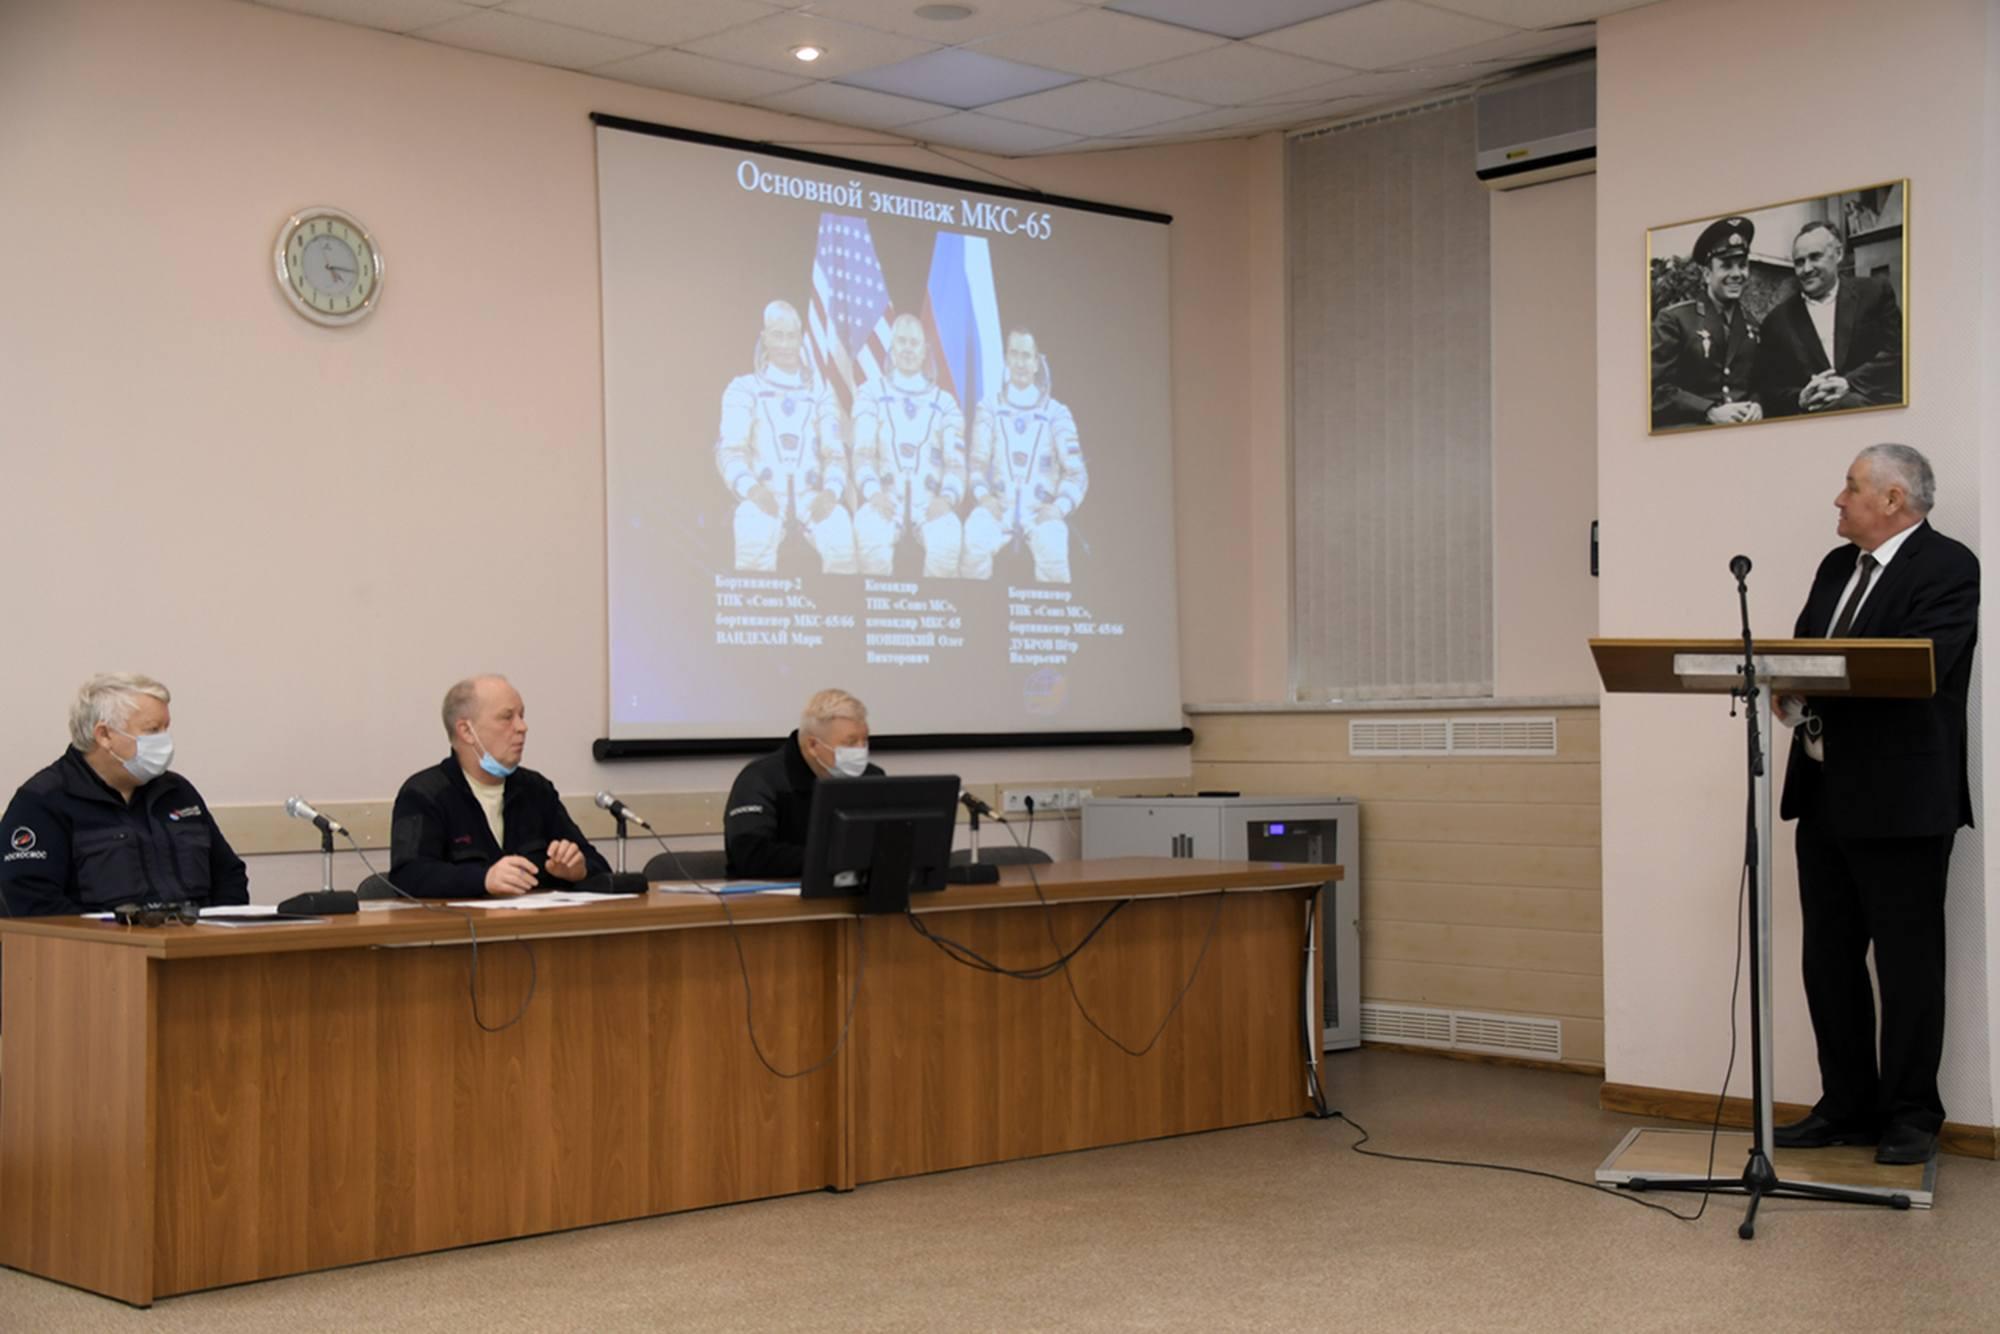 Intervention de Valery Korzun, représentant le TsPK.